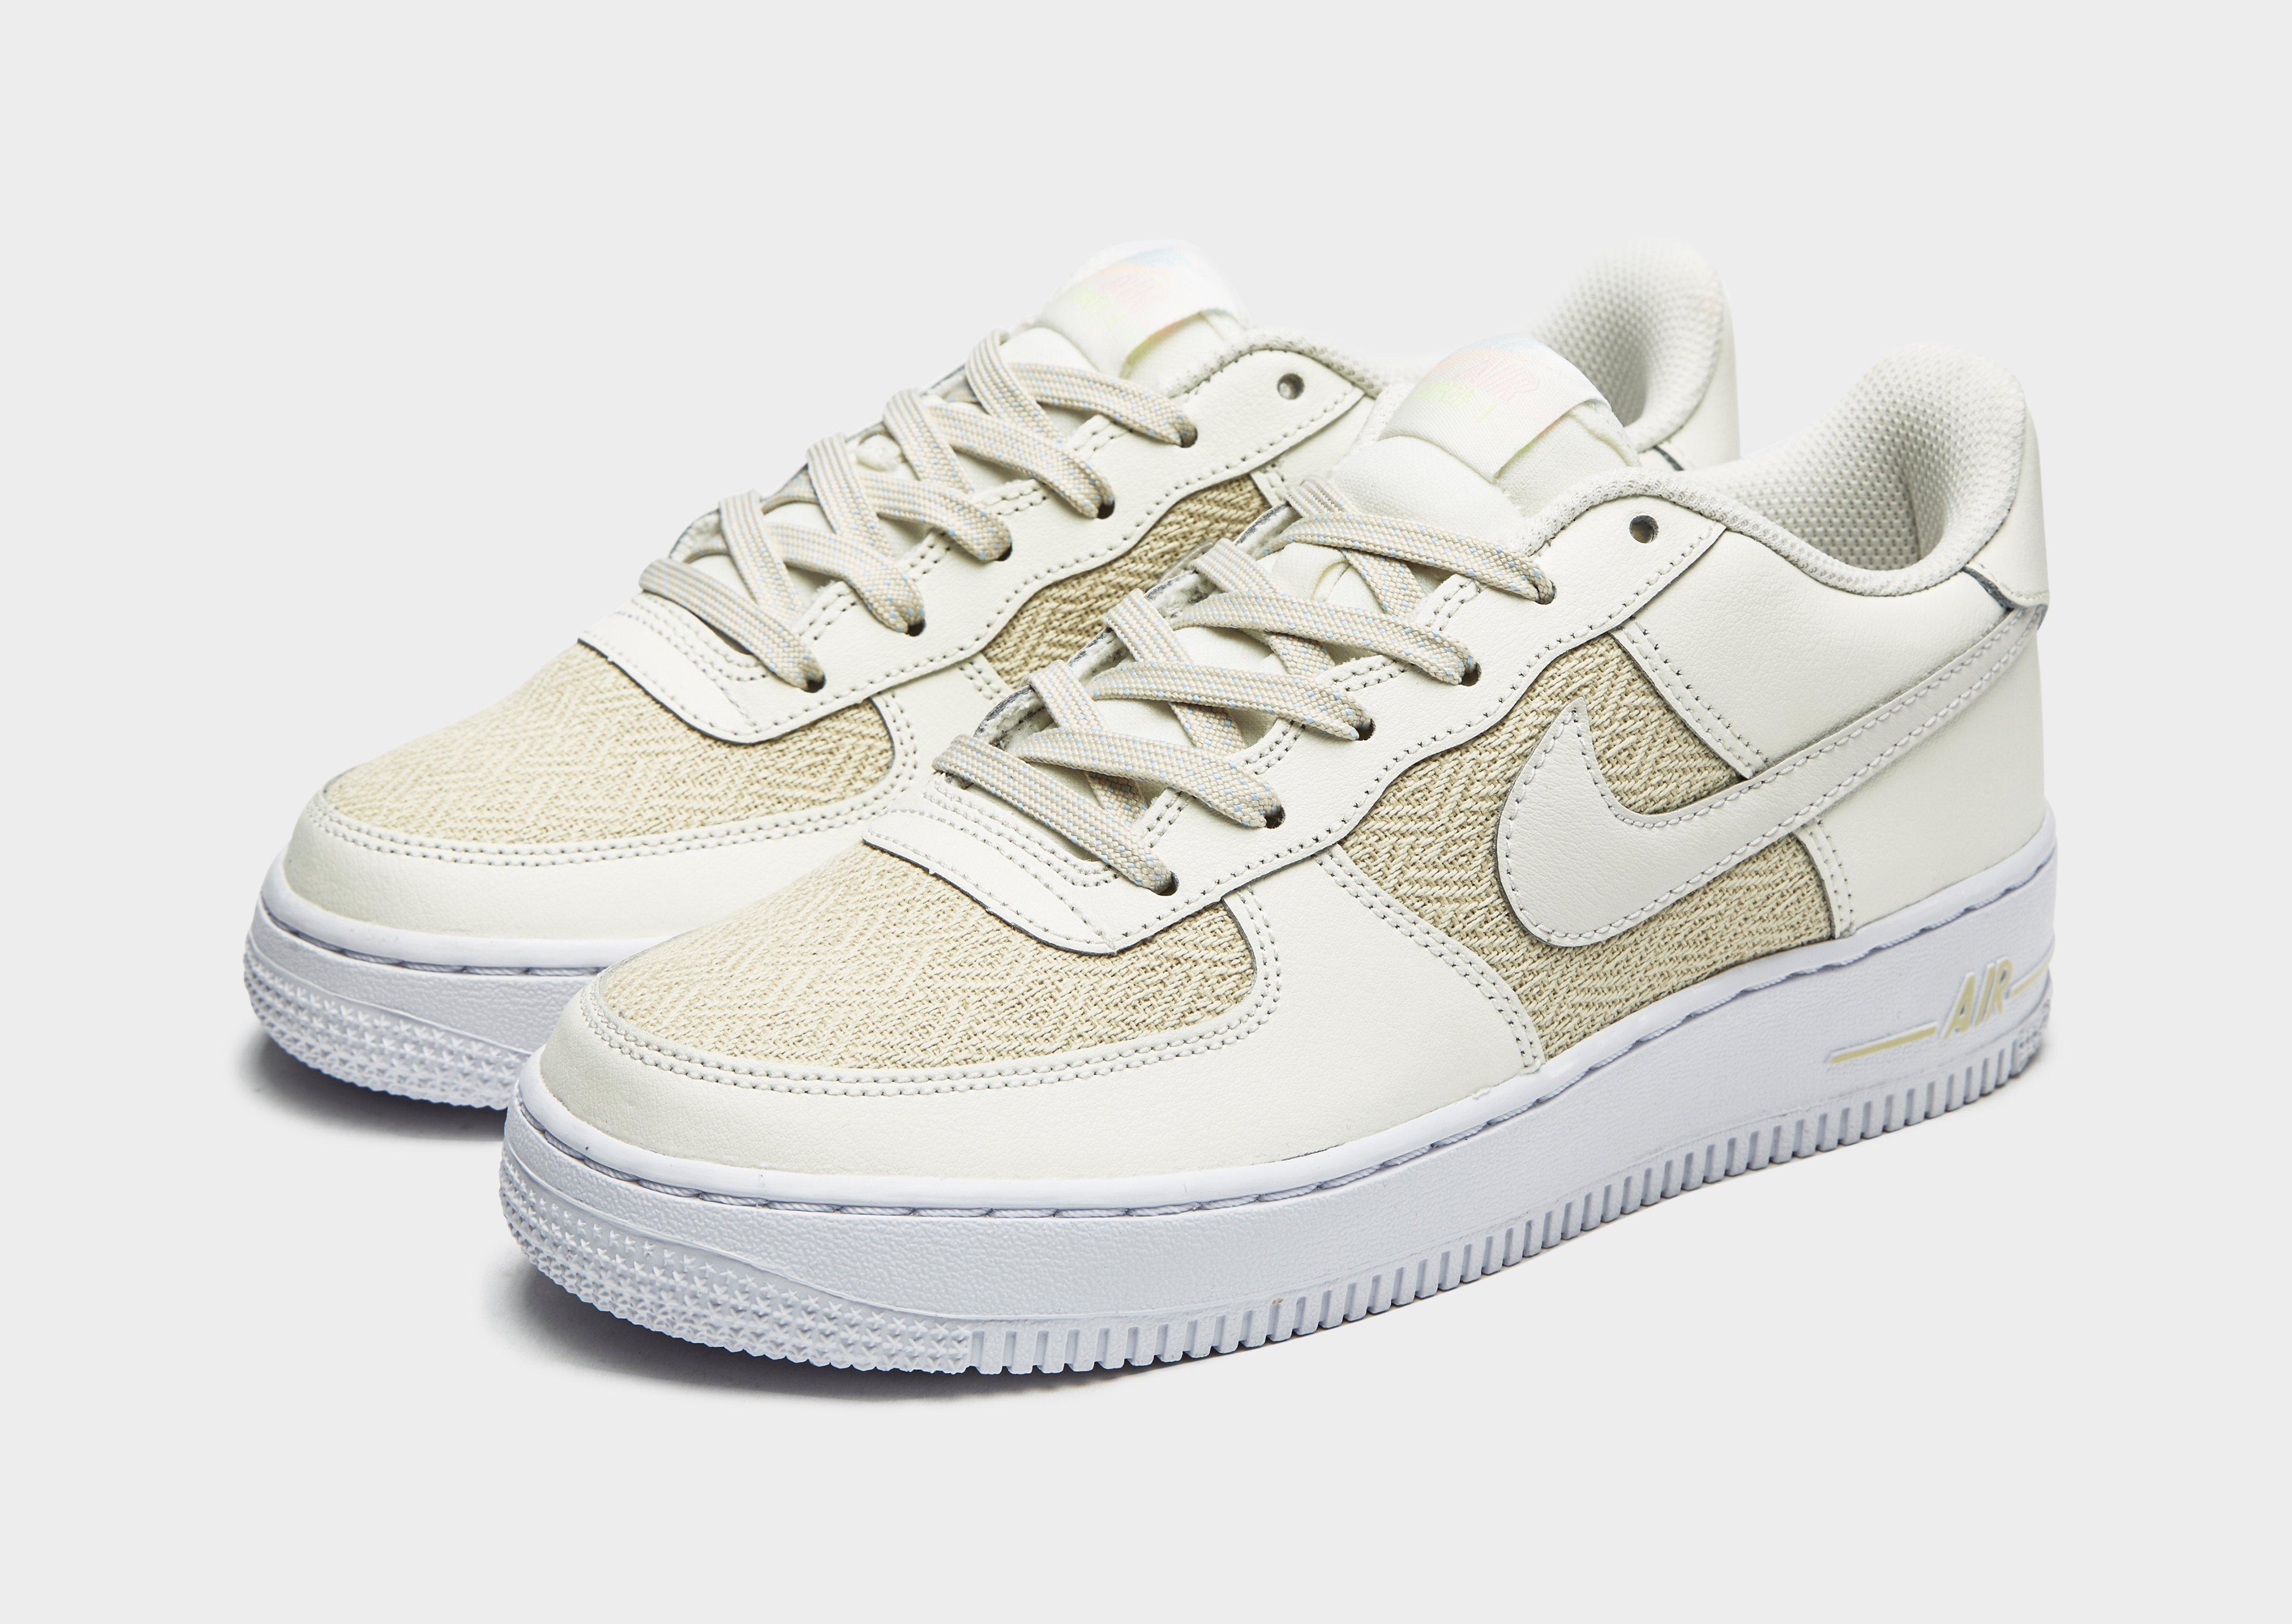 9d48c46fa0b6 Nike Dunk Bota Oreo Huaraches